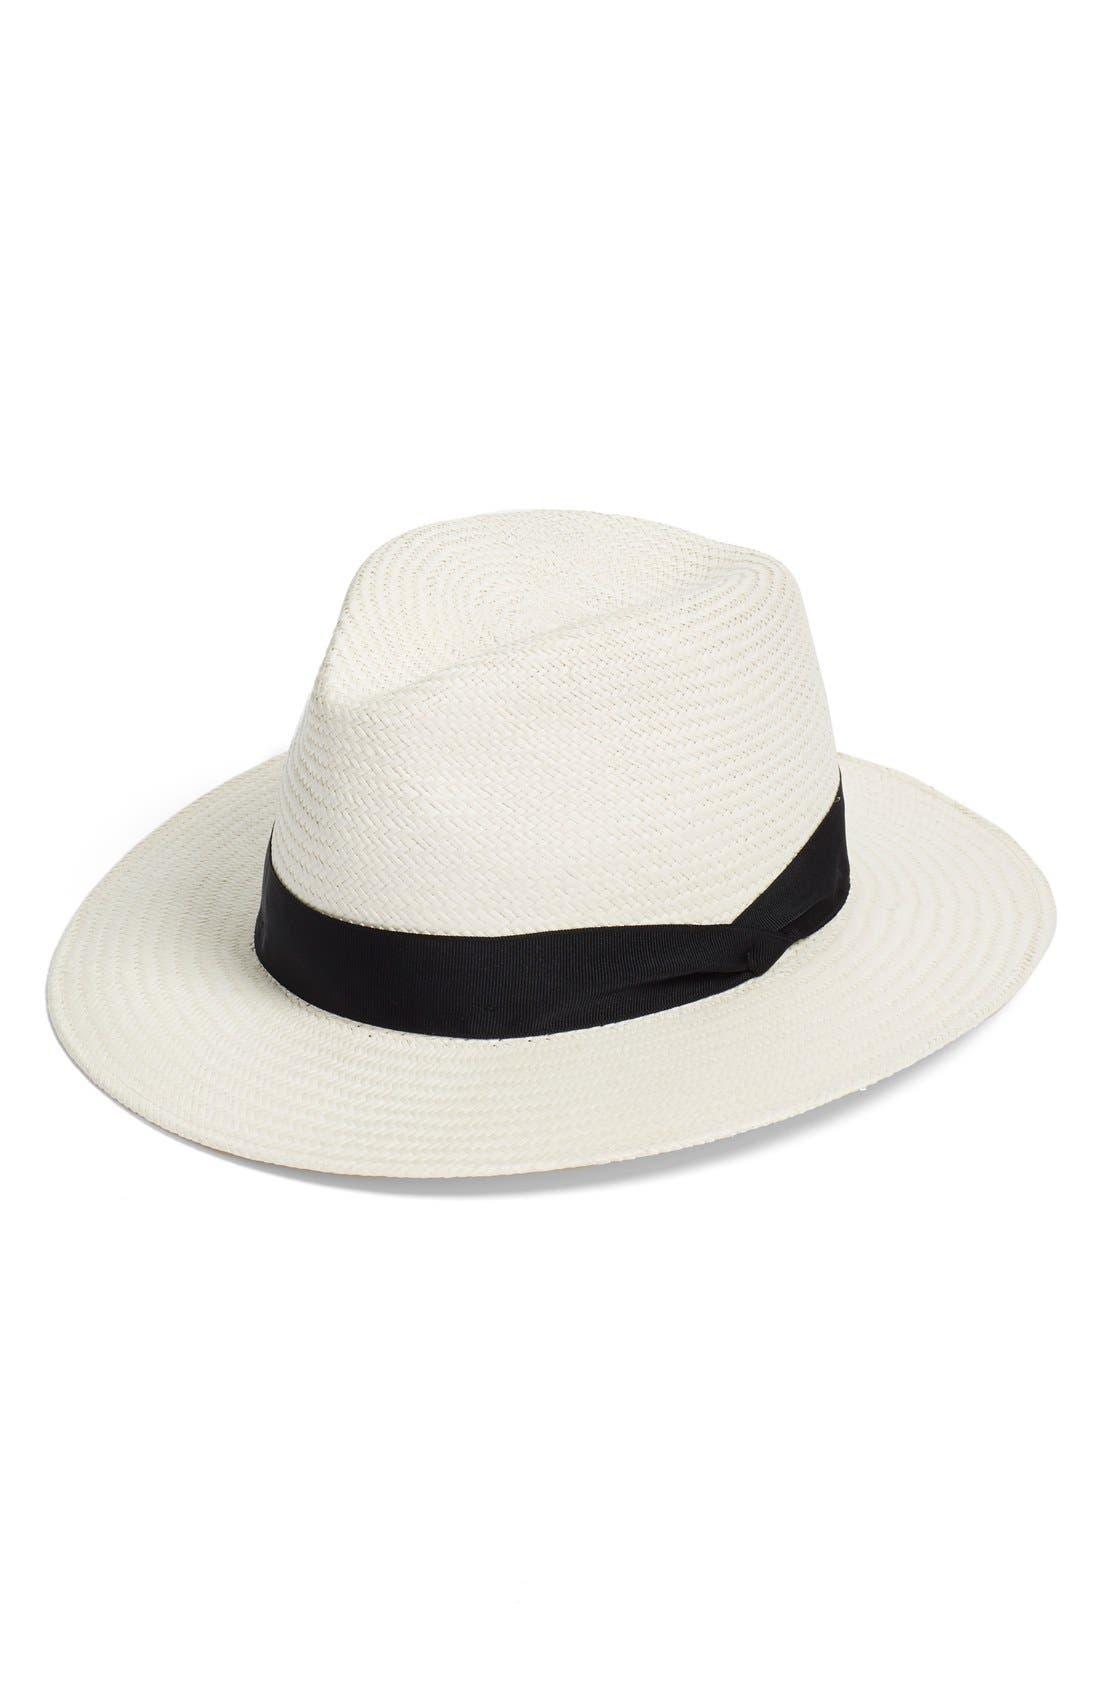 RAG & BONE, Straw Panama Hat, Main thumbnail 1, color, WHITE